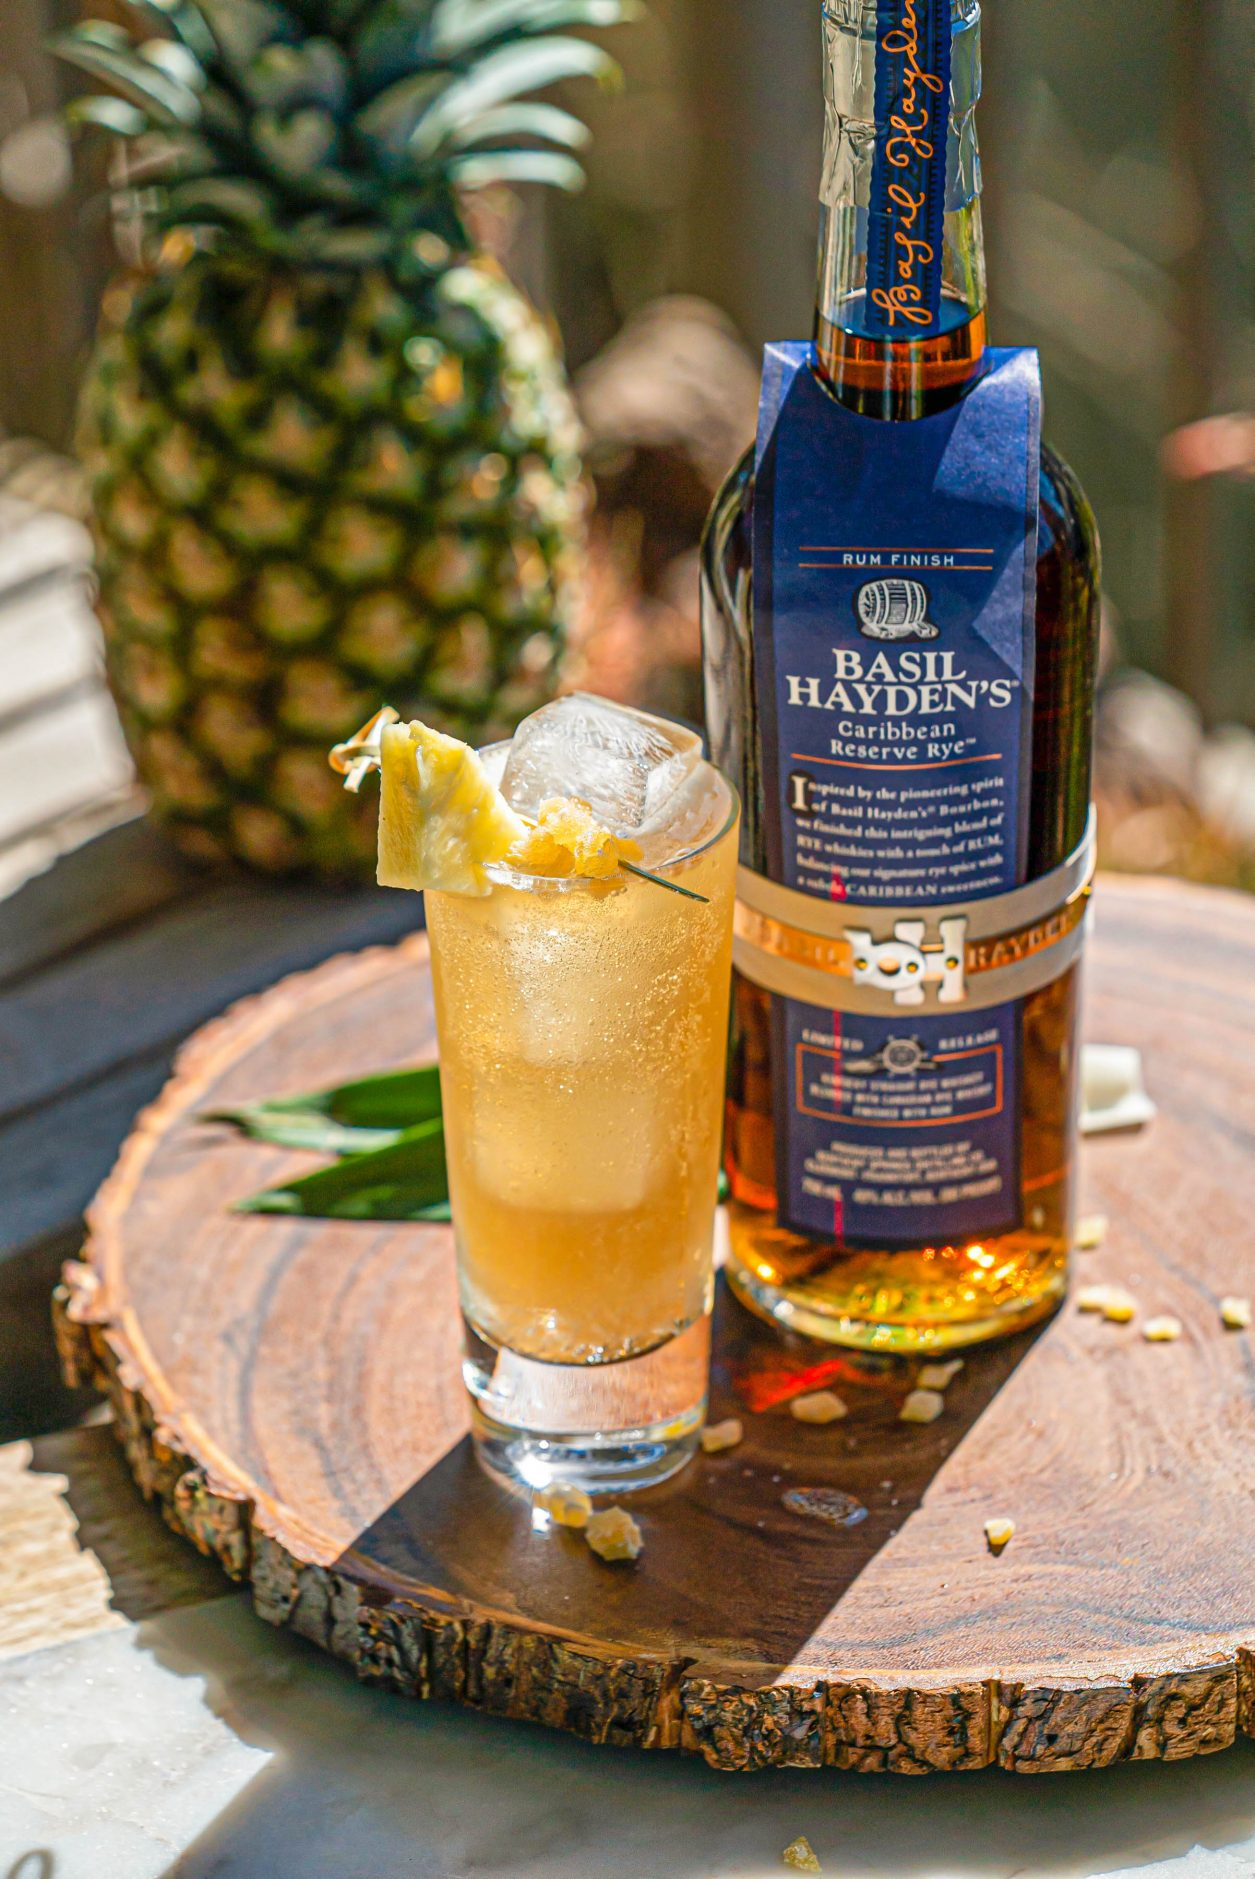 Basil Hayden_s Caribbean Reserve Rye_Endless Summer_Image 4 (2)